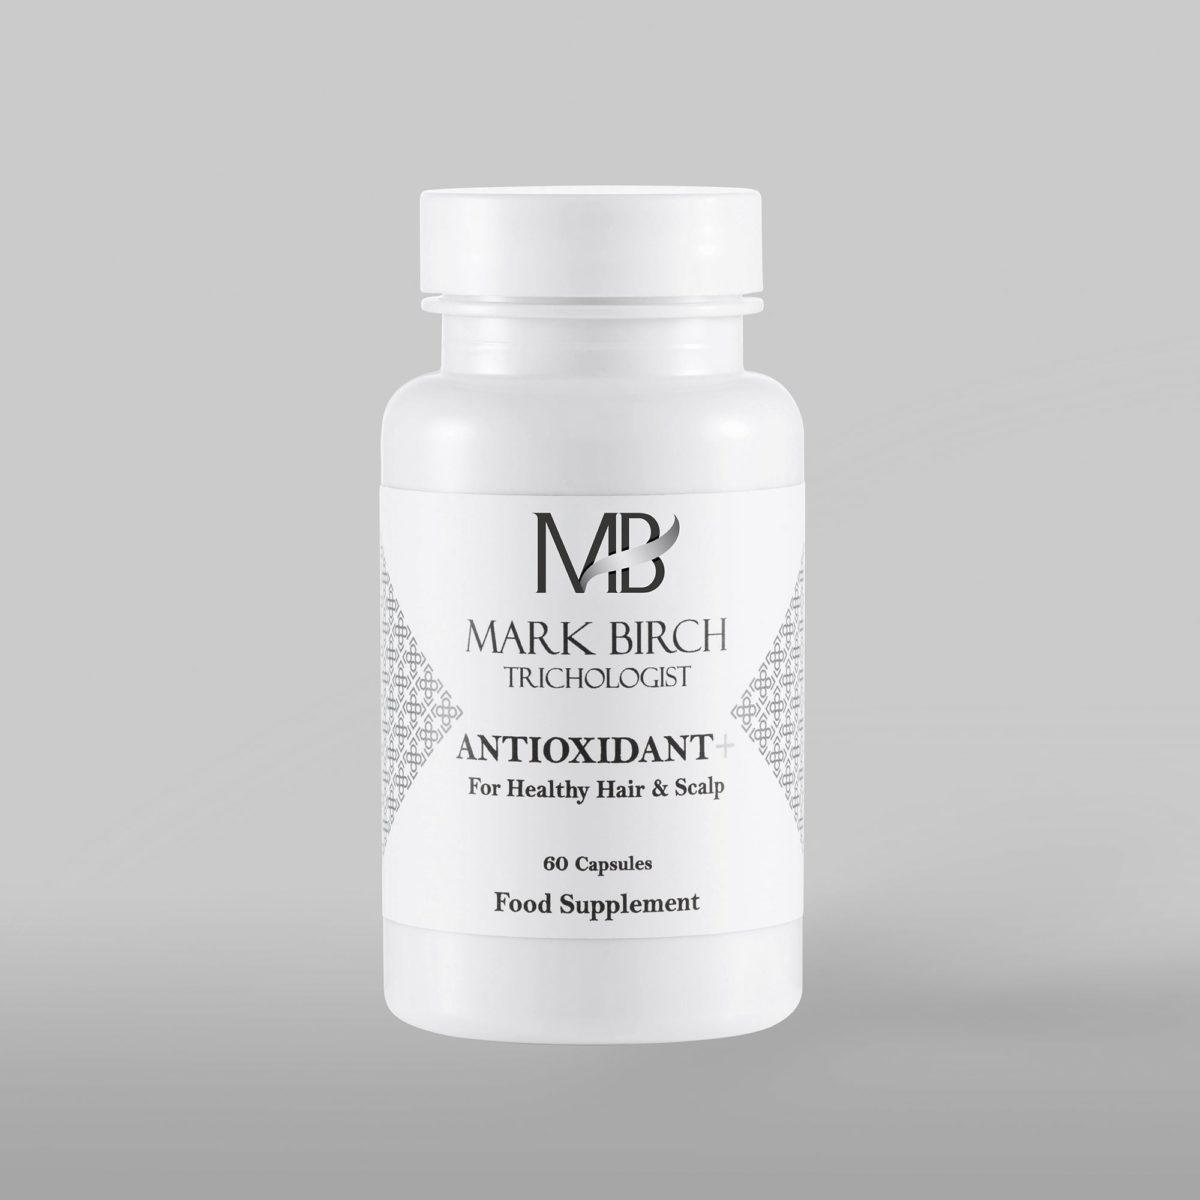 markbirch_antioxidant_2000x2000px-1200x1200